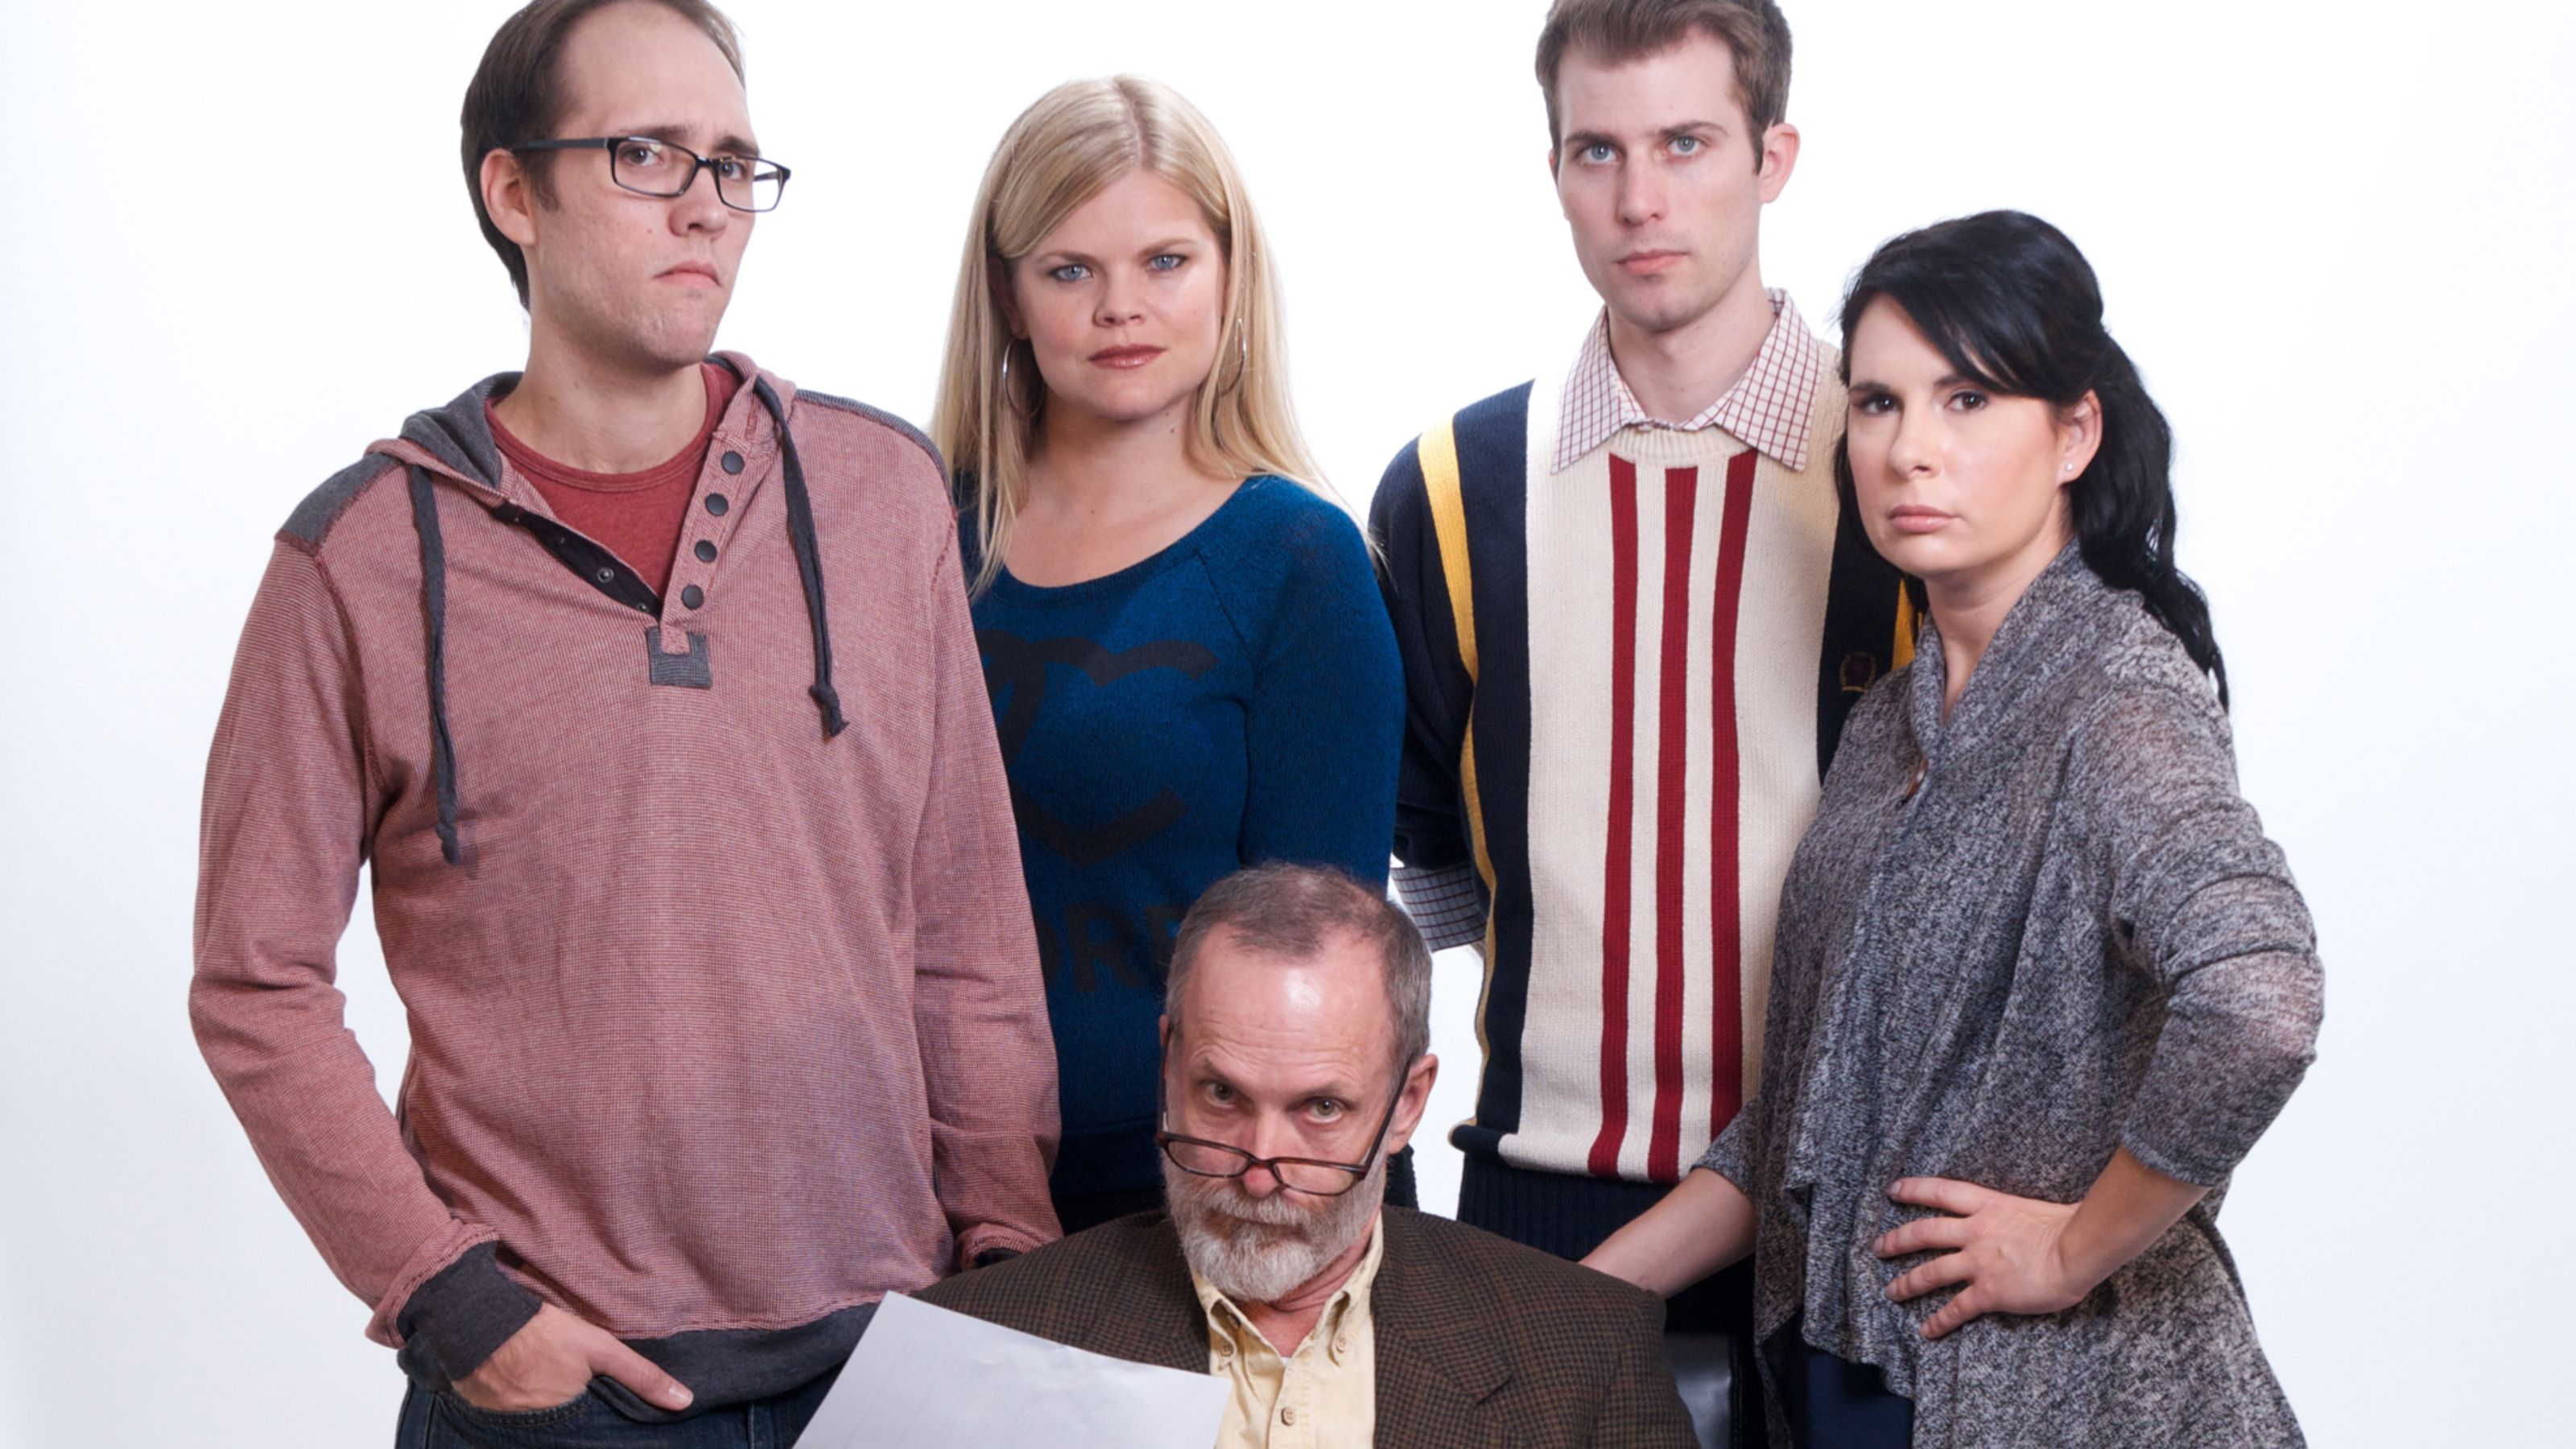 Actors Theatre 2014 Seminar. David Barker (front), Will Hightower, Kim Richard, Andy Cahoon, Kerry McCue. Photo by John Groseclose.